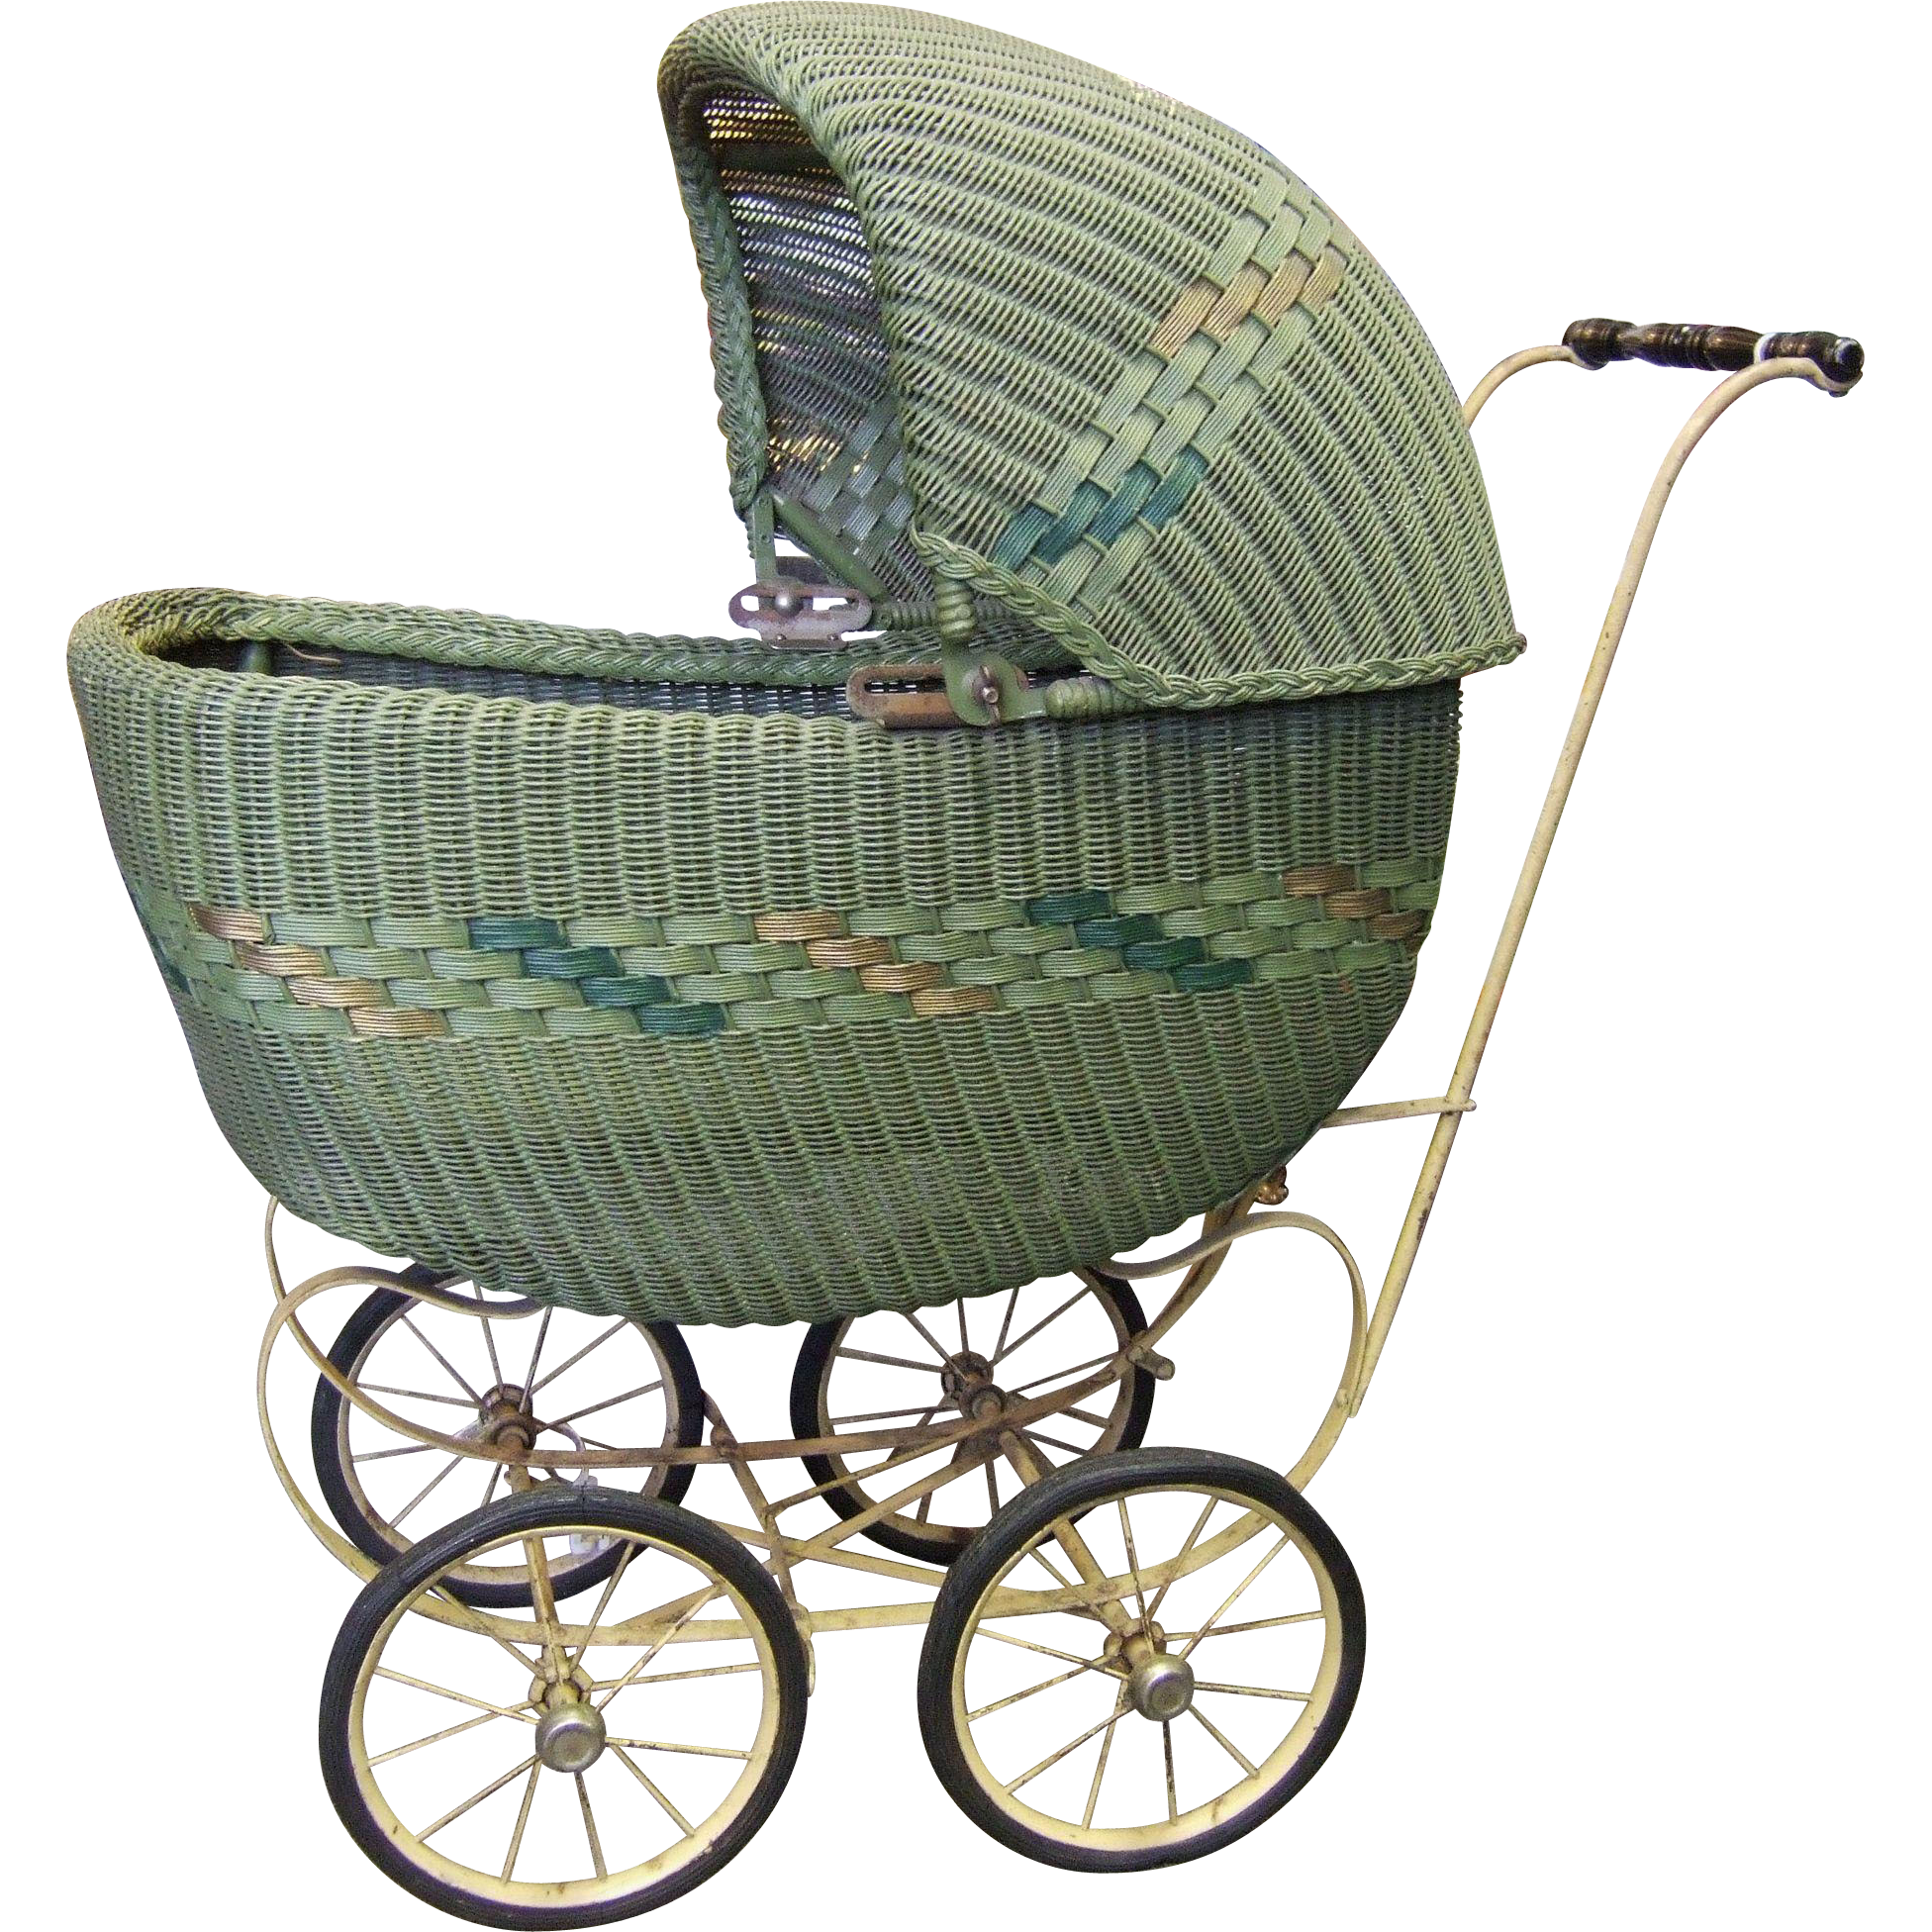 Heywood Wakefield Wicker Rattan Doll Carriage